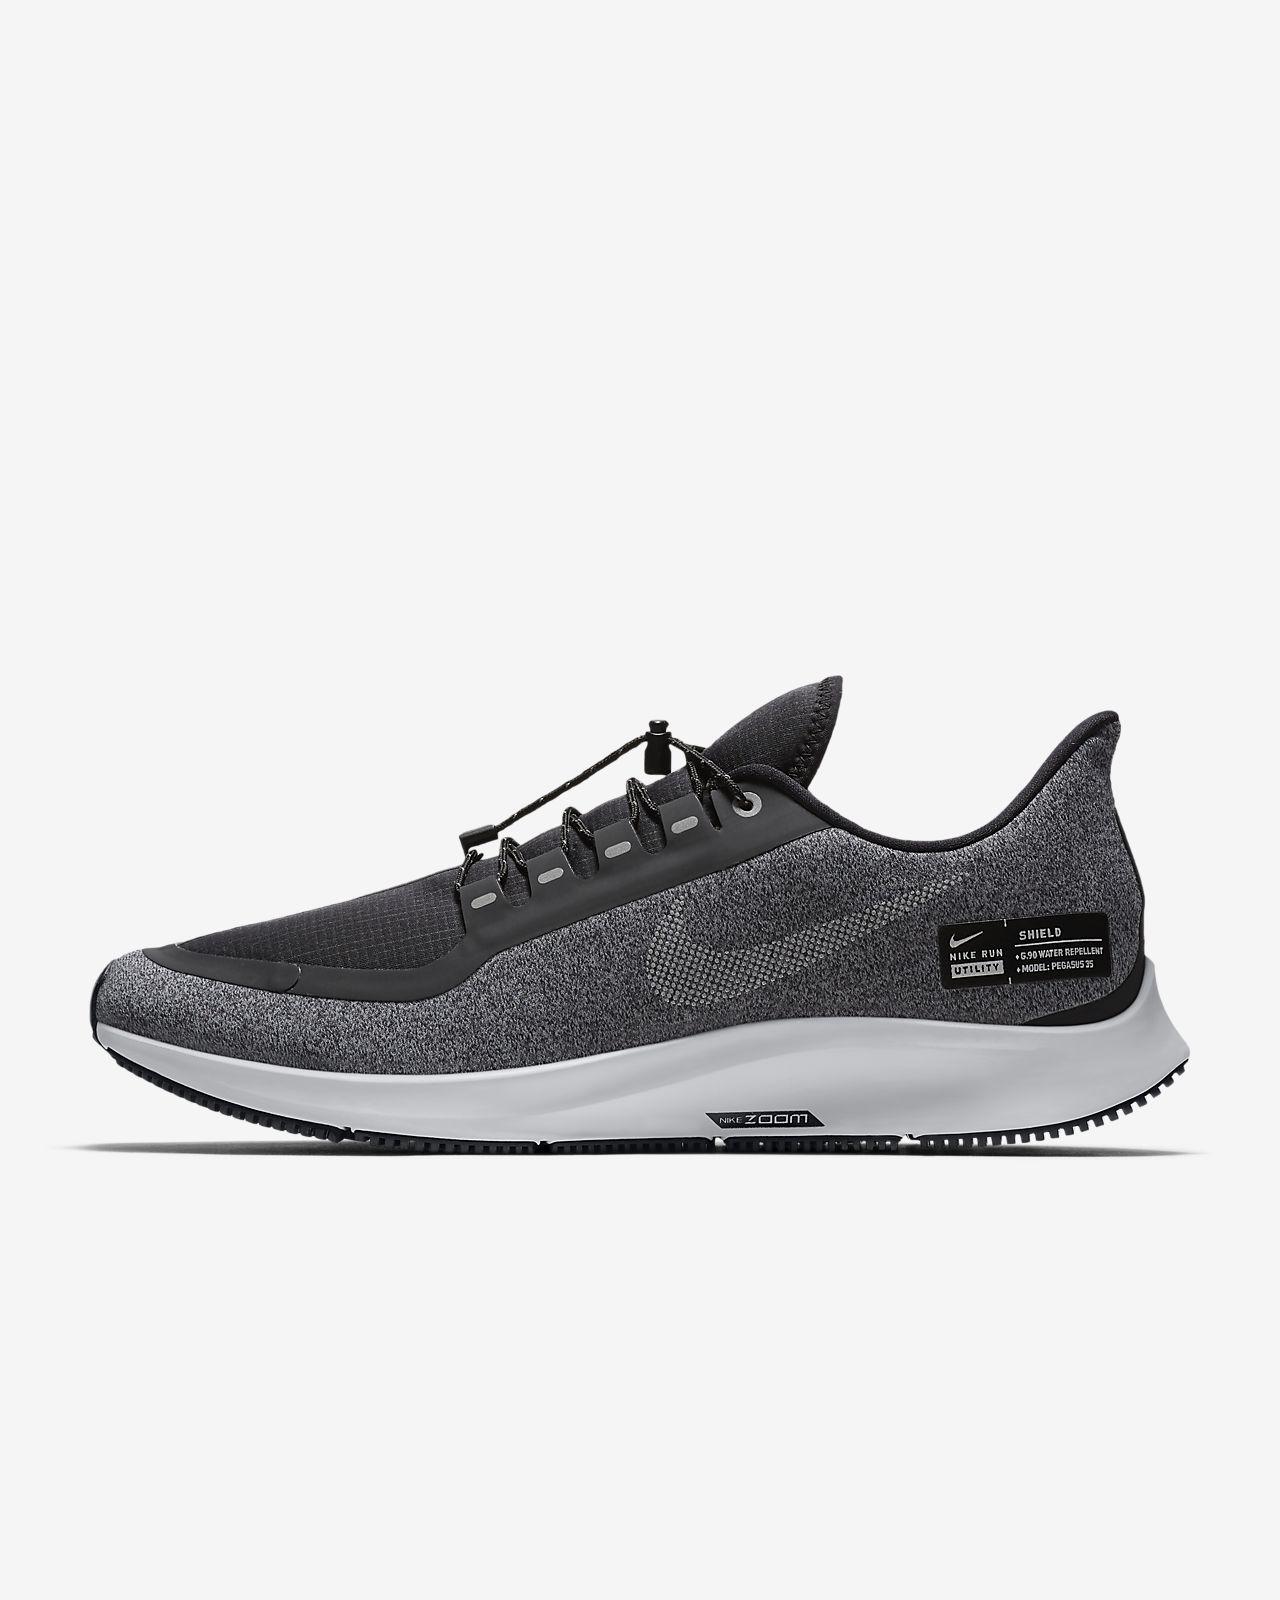 0f9cde5db68 Pánská běžecká bota Nike Air Zoom Pegasus 35 Shield Water-Repellent ...